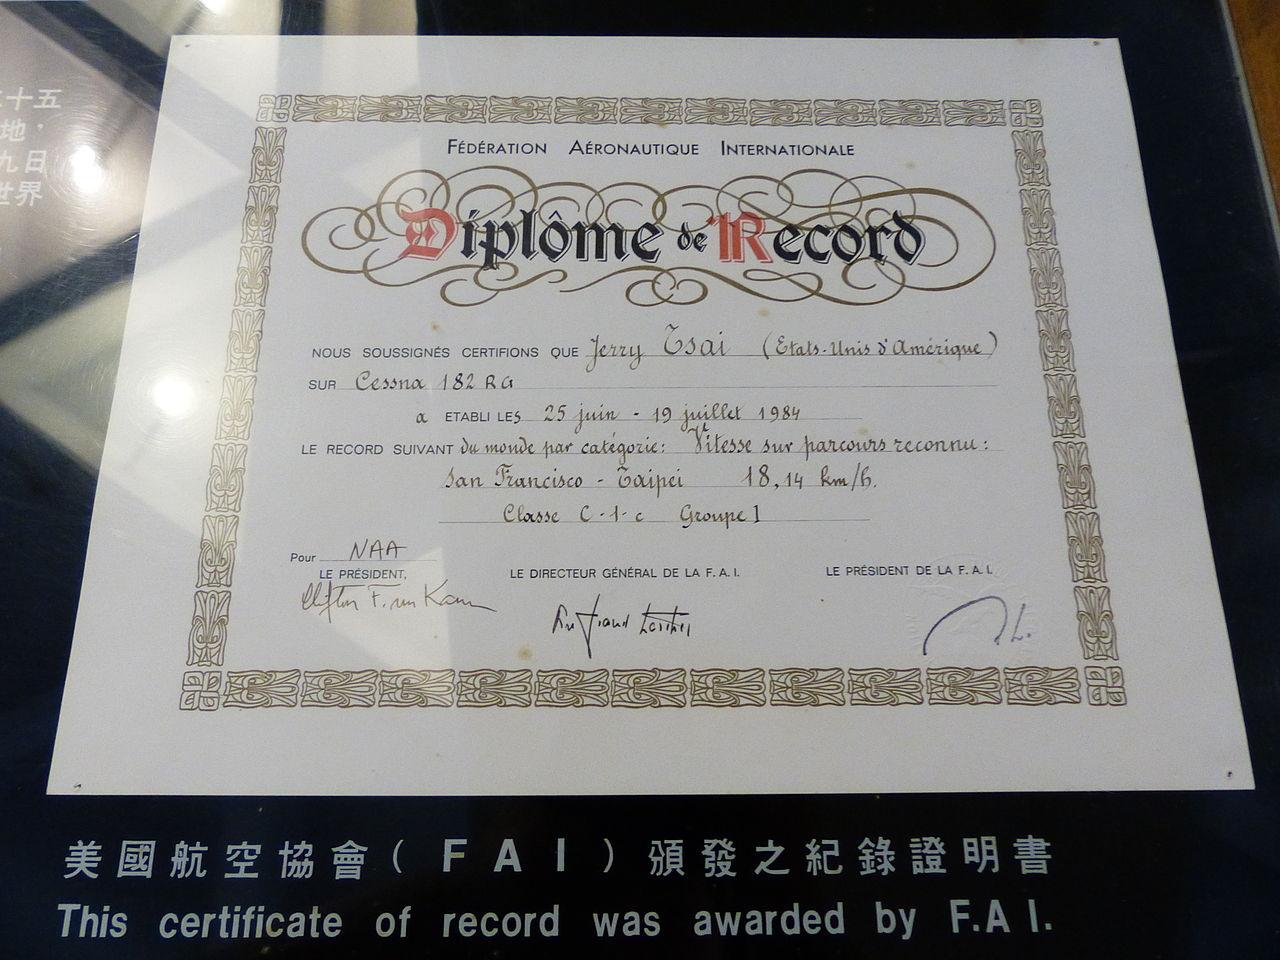 Filecertification Of Jerry Tsai Flight Record Award By Fdration